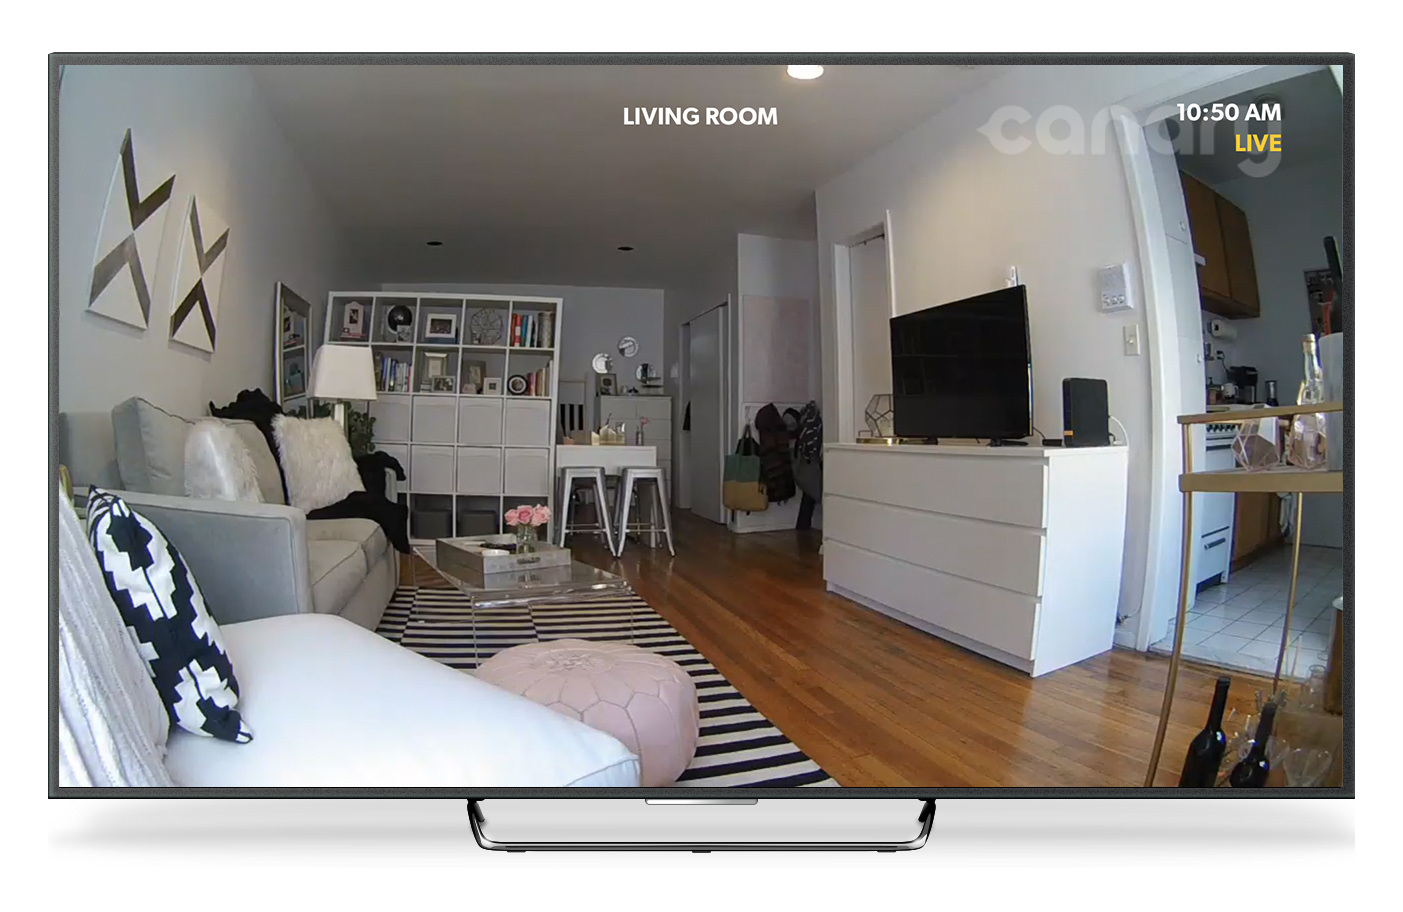 tv-image-2